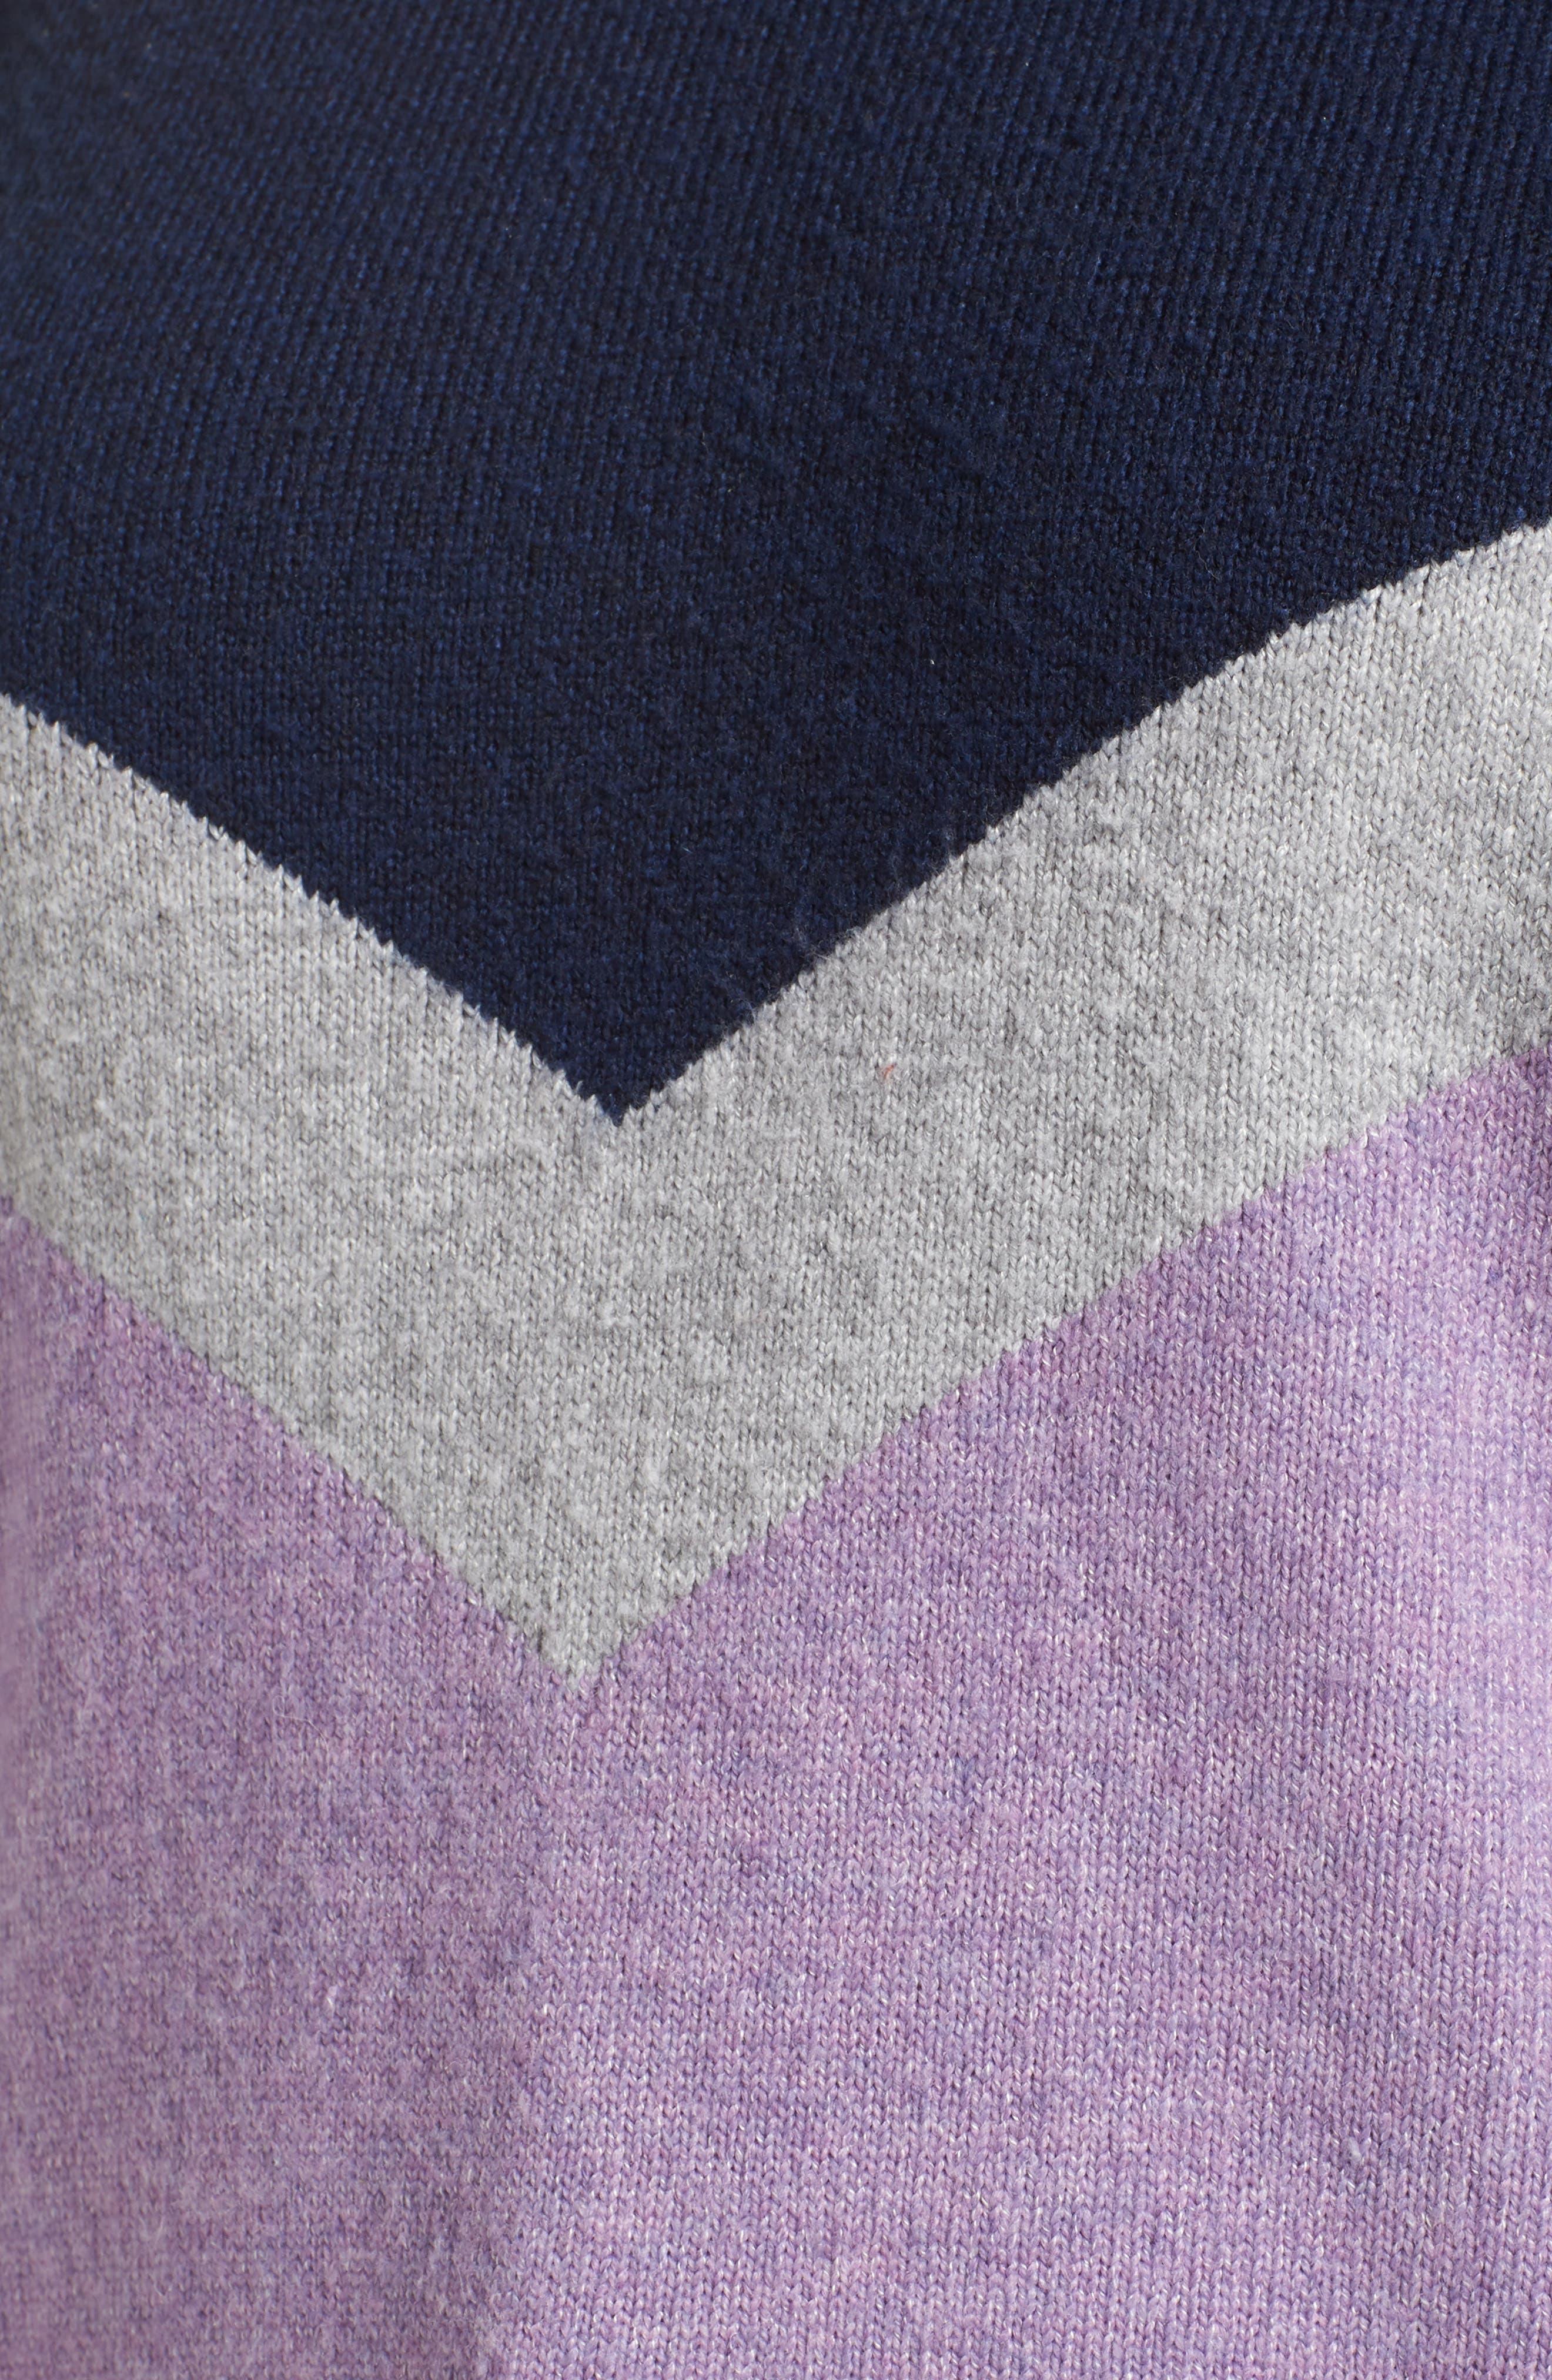 Chevron Stripe Sweater,                             Alternate thumbnail 5, color,                             PURPLE WAVE CHALET